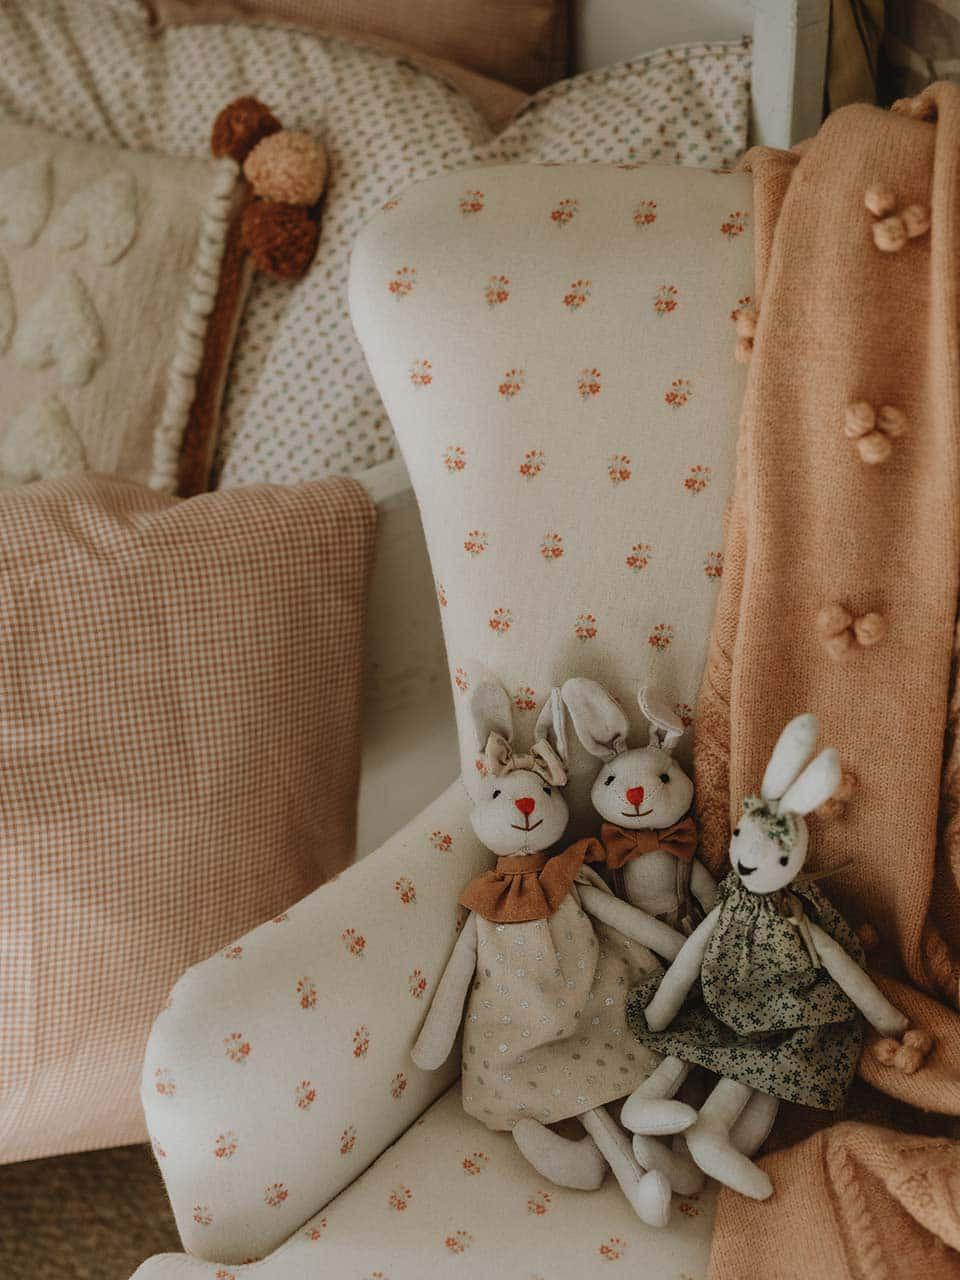 《ZARA HOME kids》2020秋冬儿童家居用品系列Lookbook